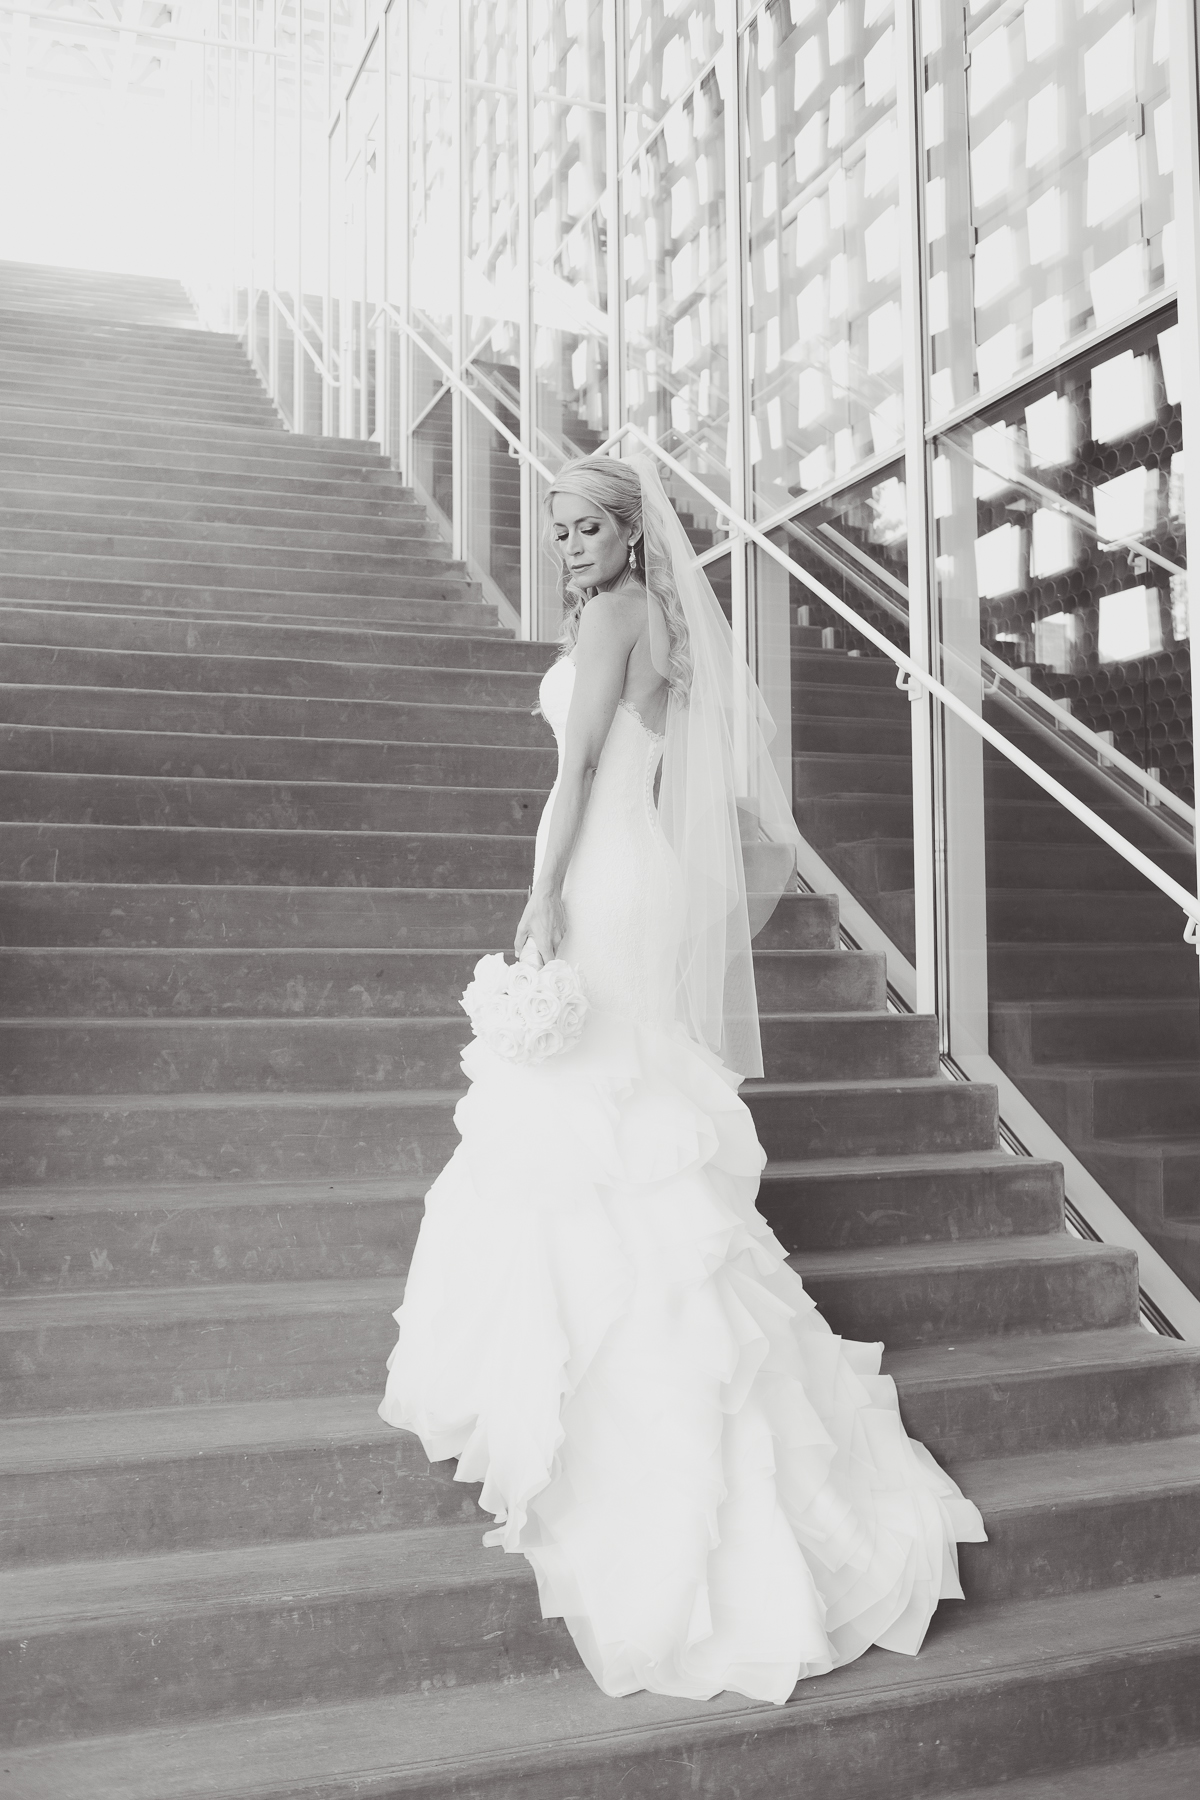 Aspen Art Museum Wedding | Wedding Dress from Little White Dress in Denver | Amy Bluestar Photography